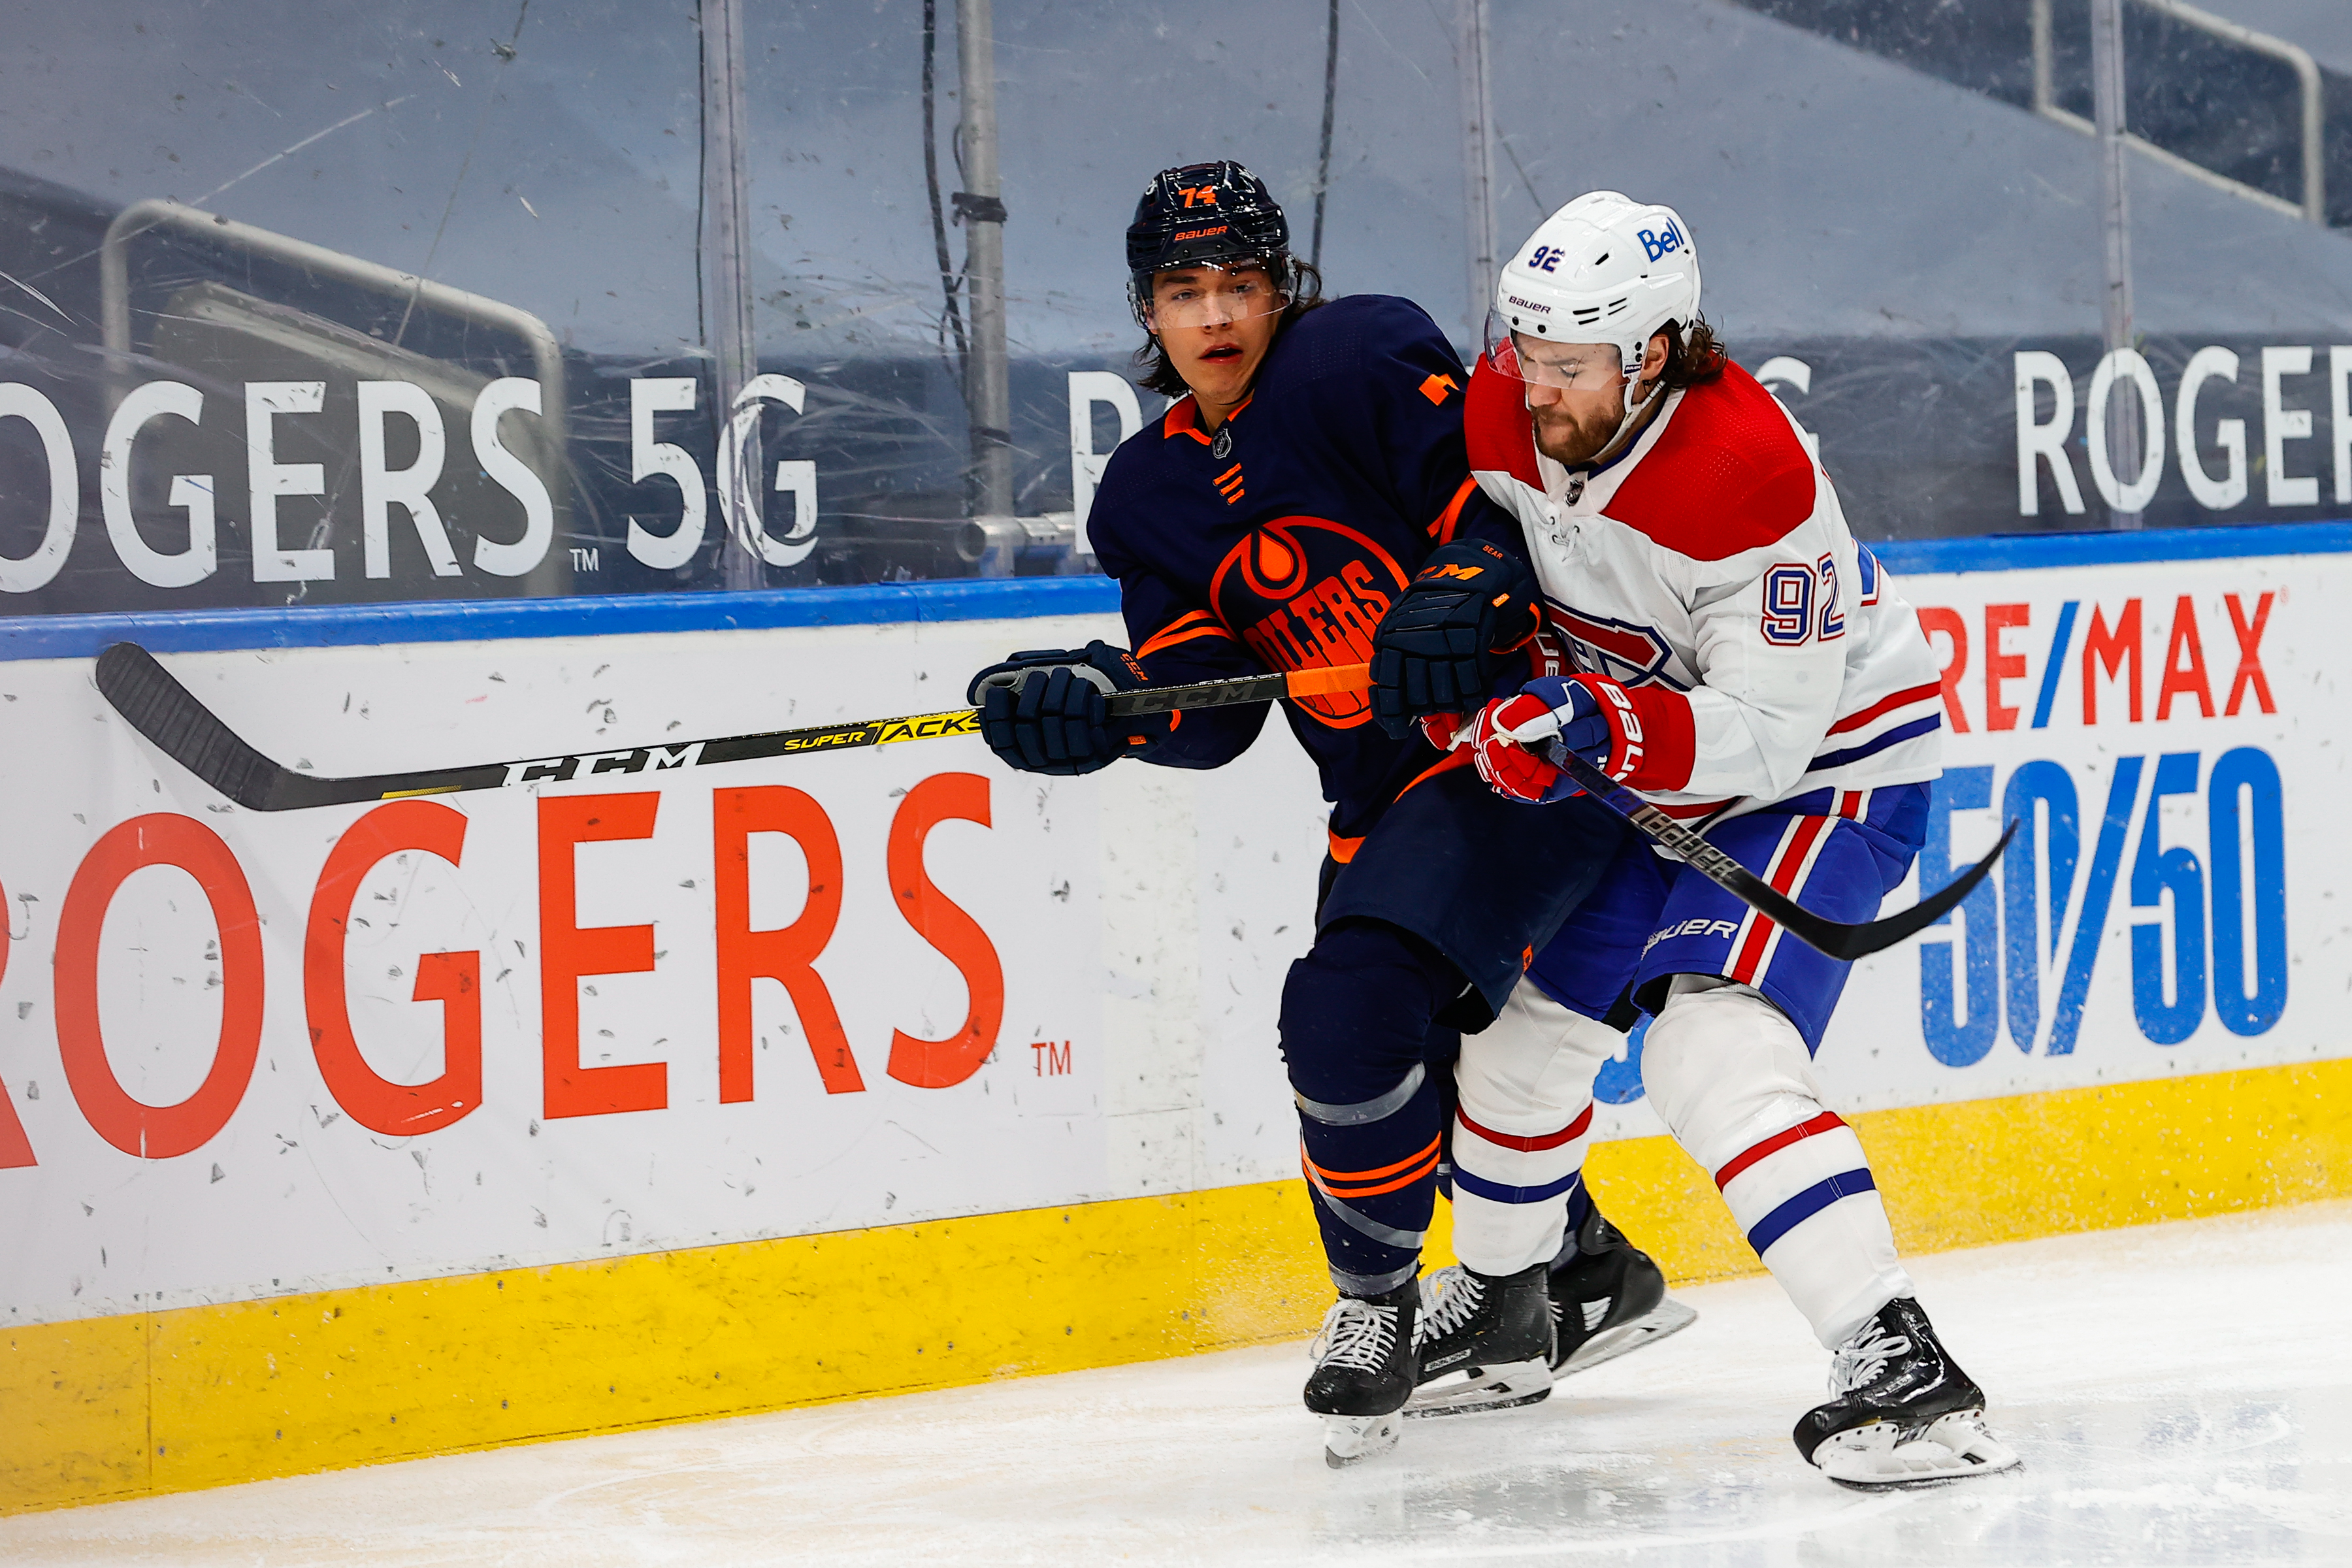 NHL: APR 19 Canadiens at Oilers